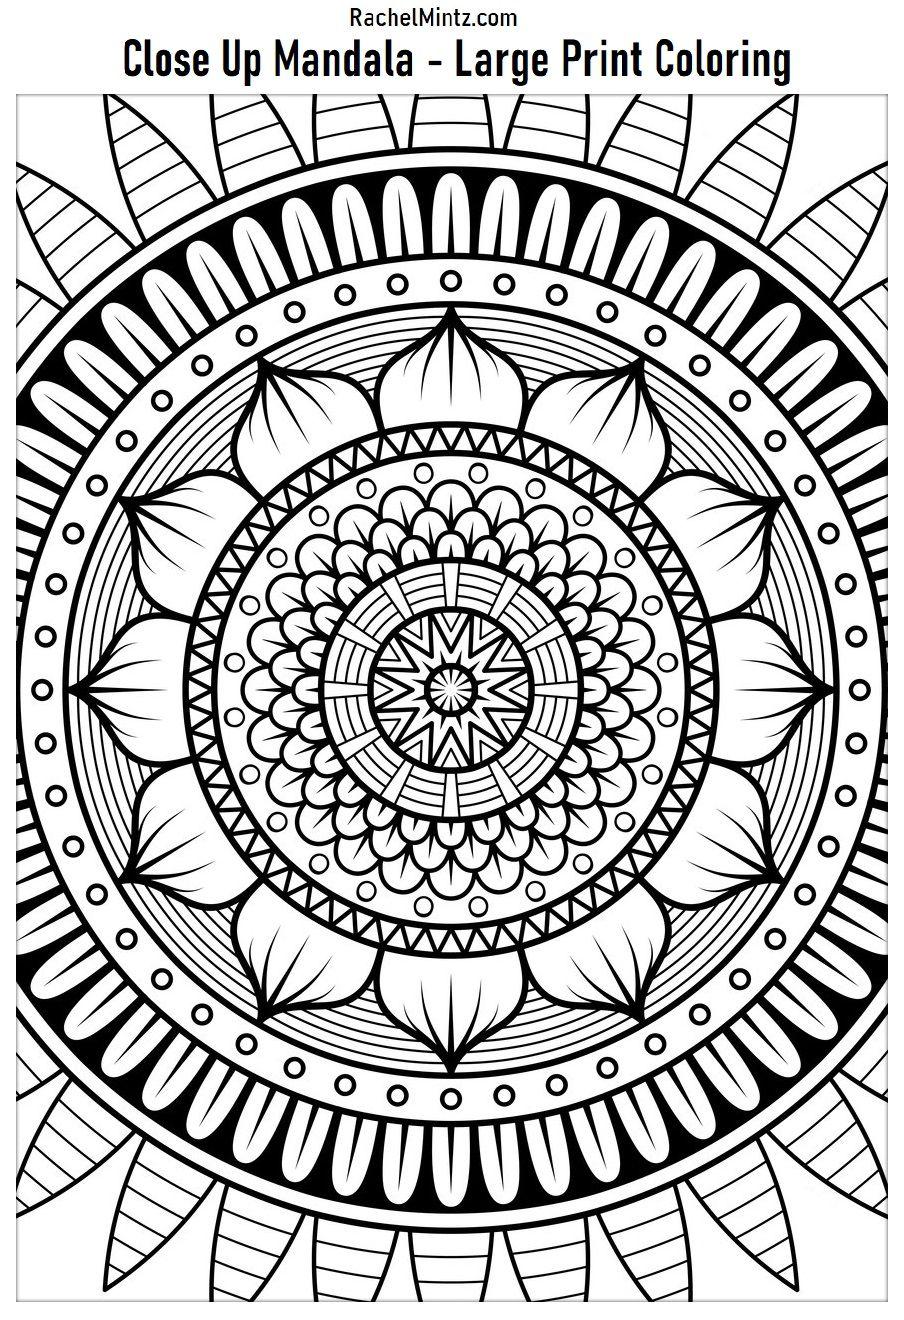 Easy Large Print Mandala Coloring Books Pattern Coloring Pages Designs Coloring Books